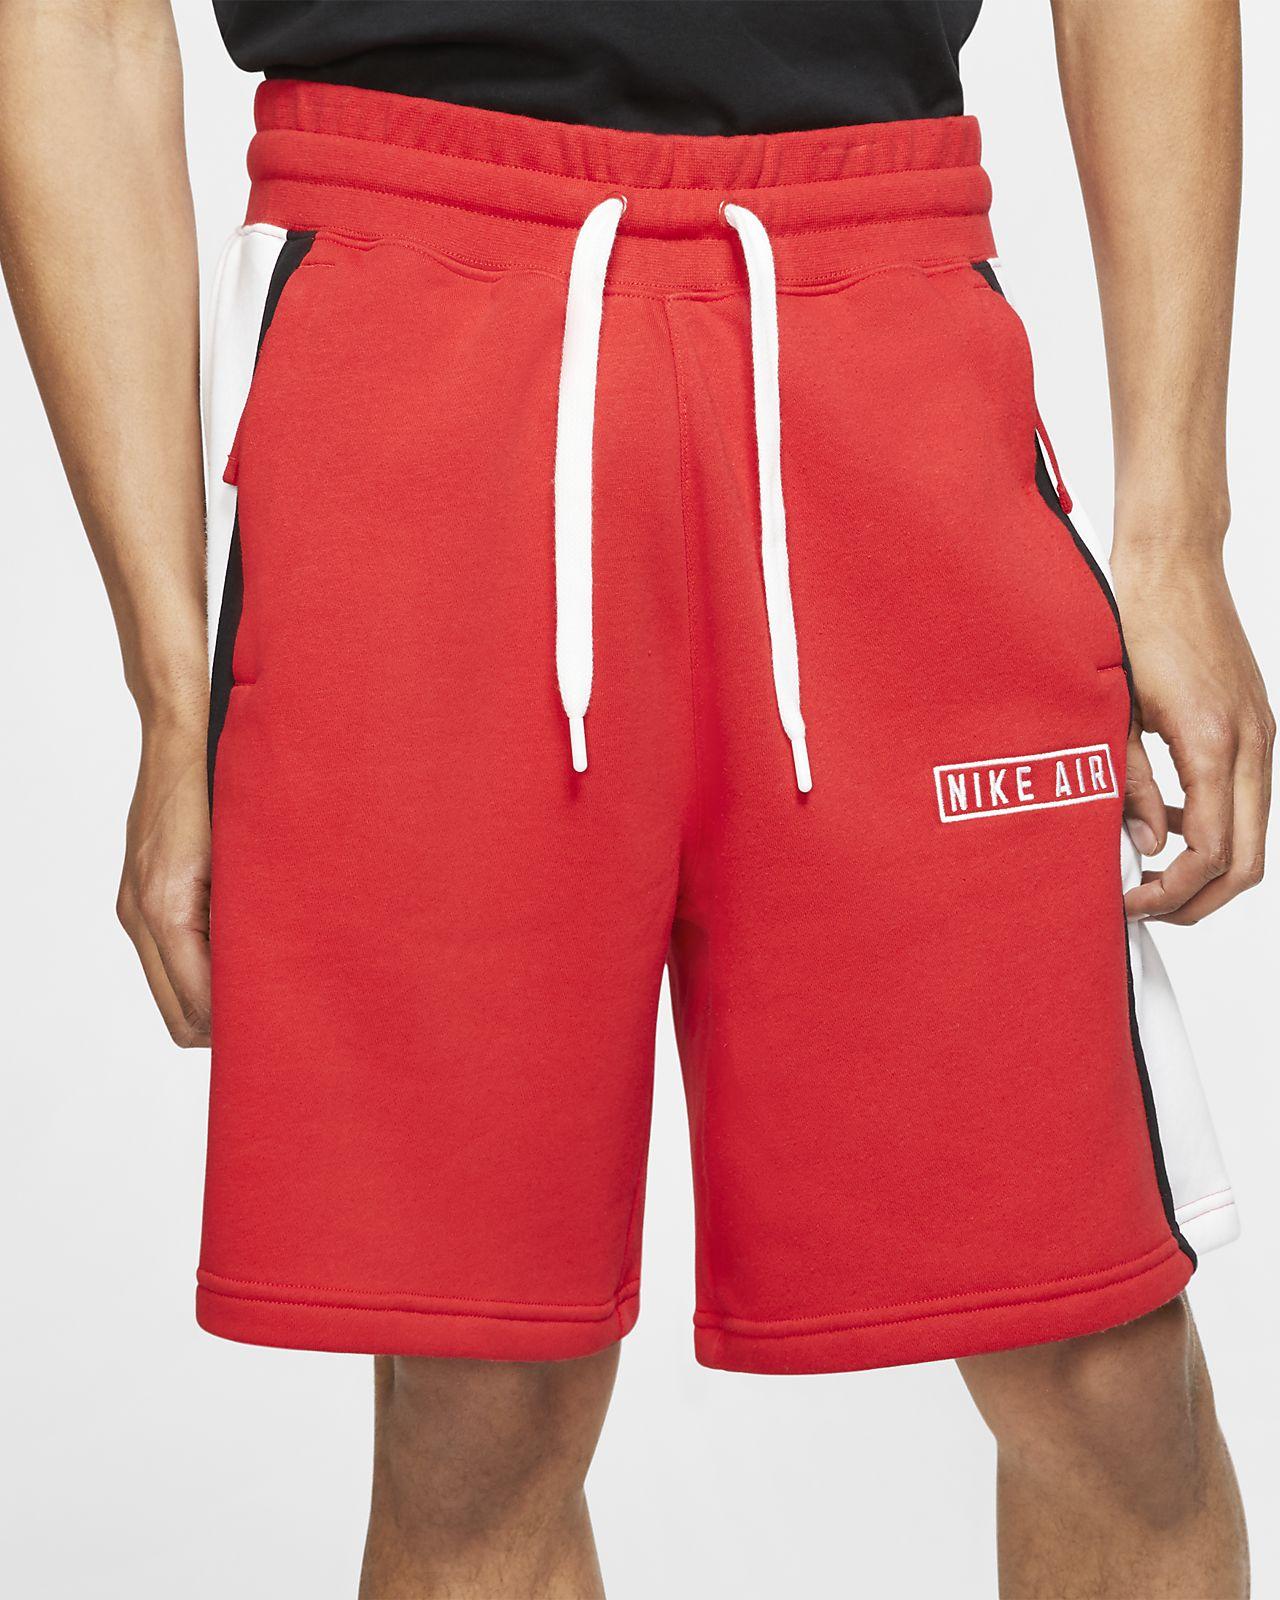 Nike Air Herrenshorts